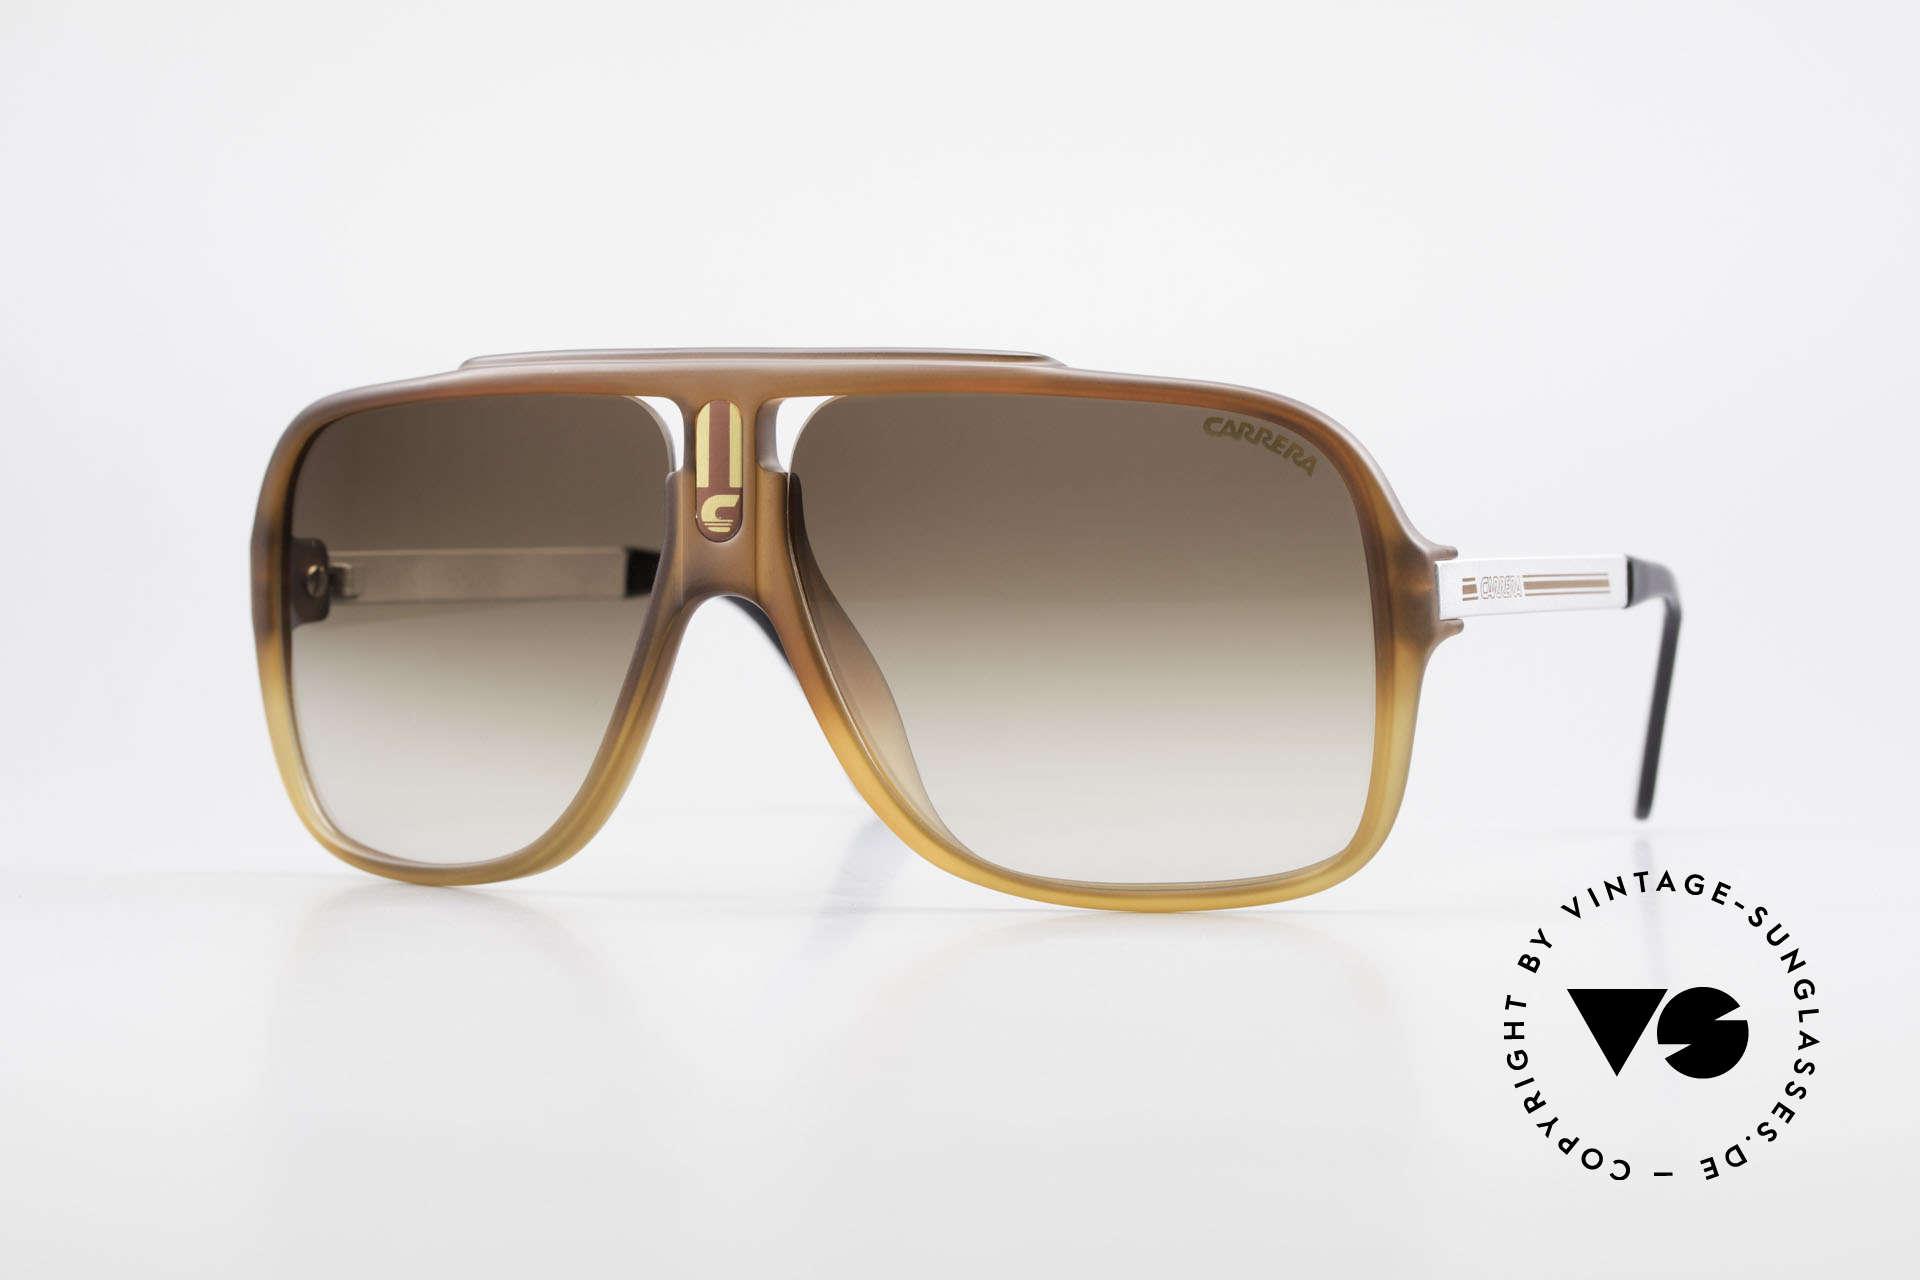 Carrera 5557 Rare Vintage Shades No Retro, incredibly rare Carrera vintage sunglasses from 1985, Made for Men